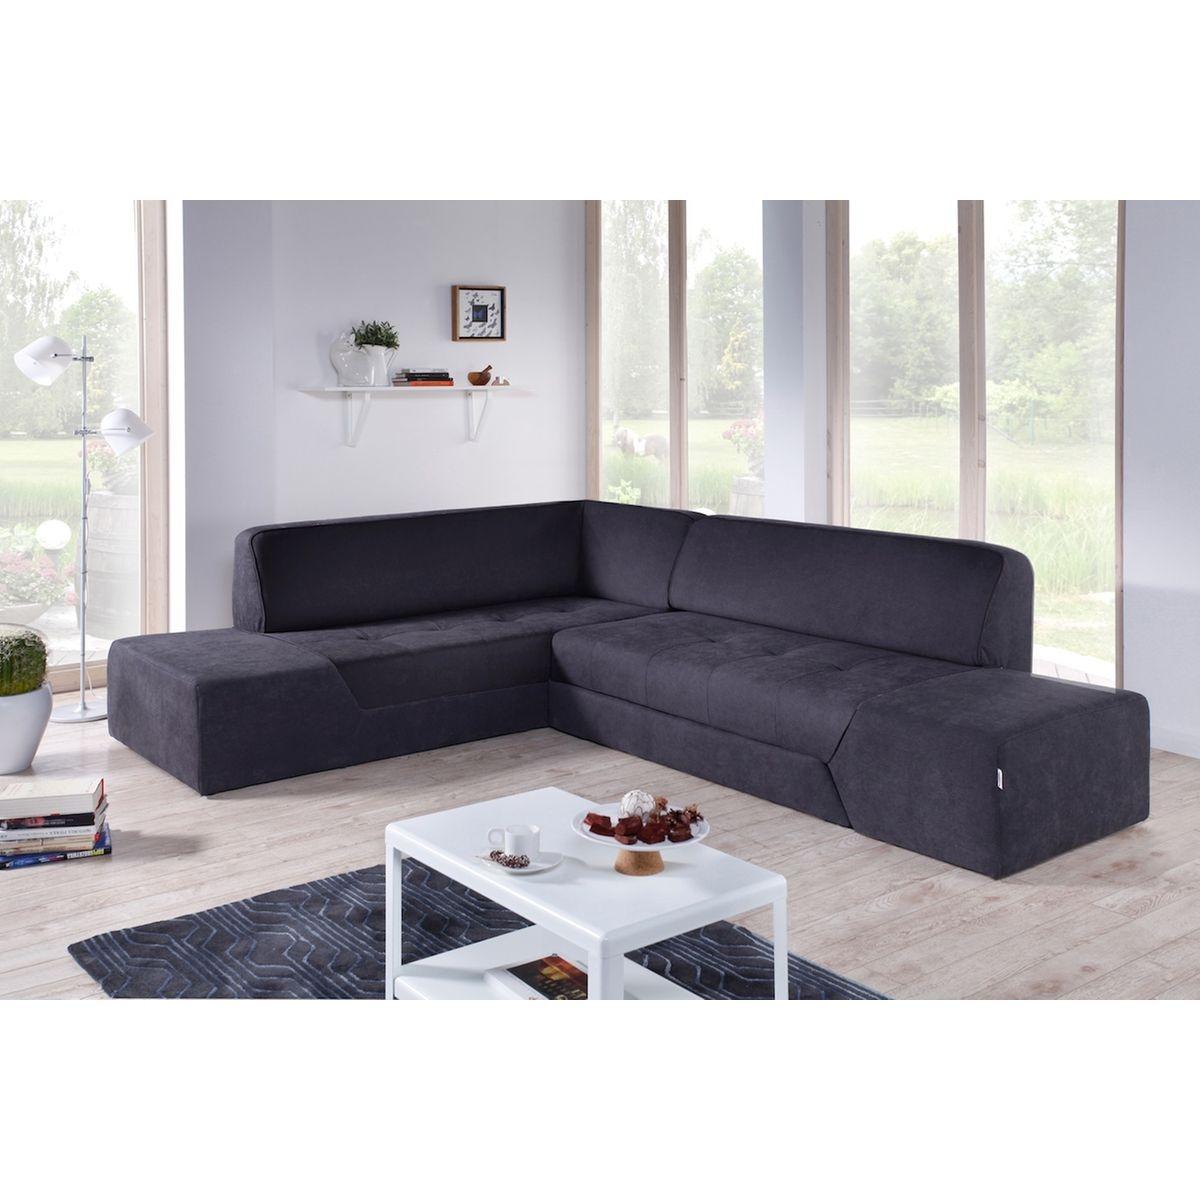 NUIT MOYENNE : Canapé convertible rectangulaire